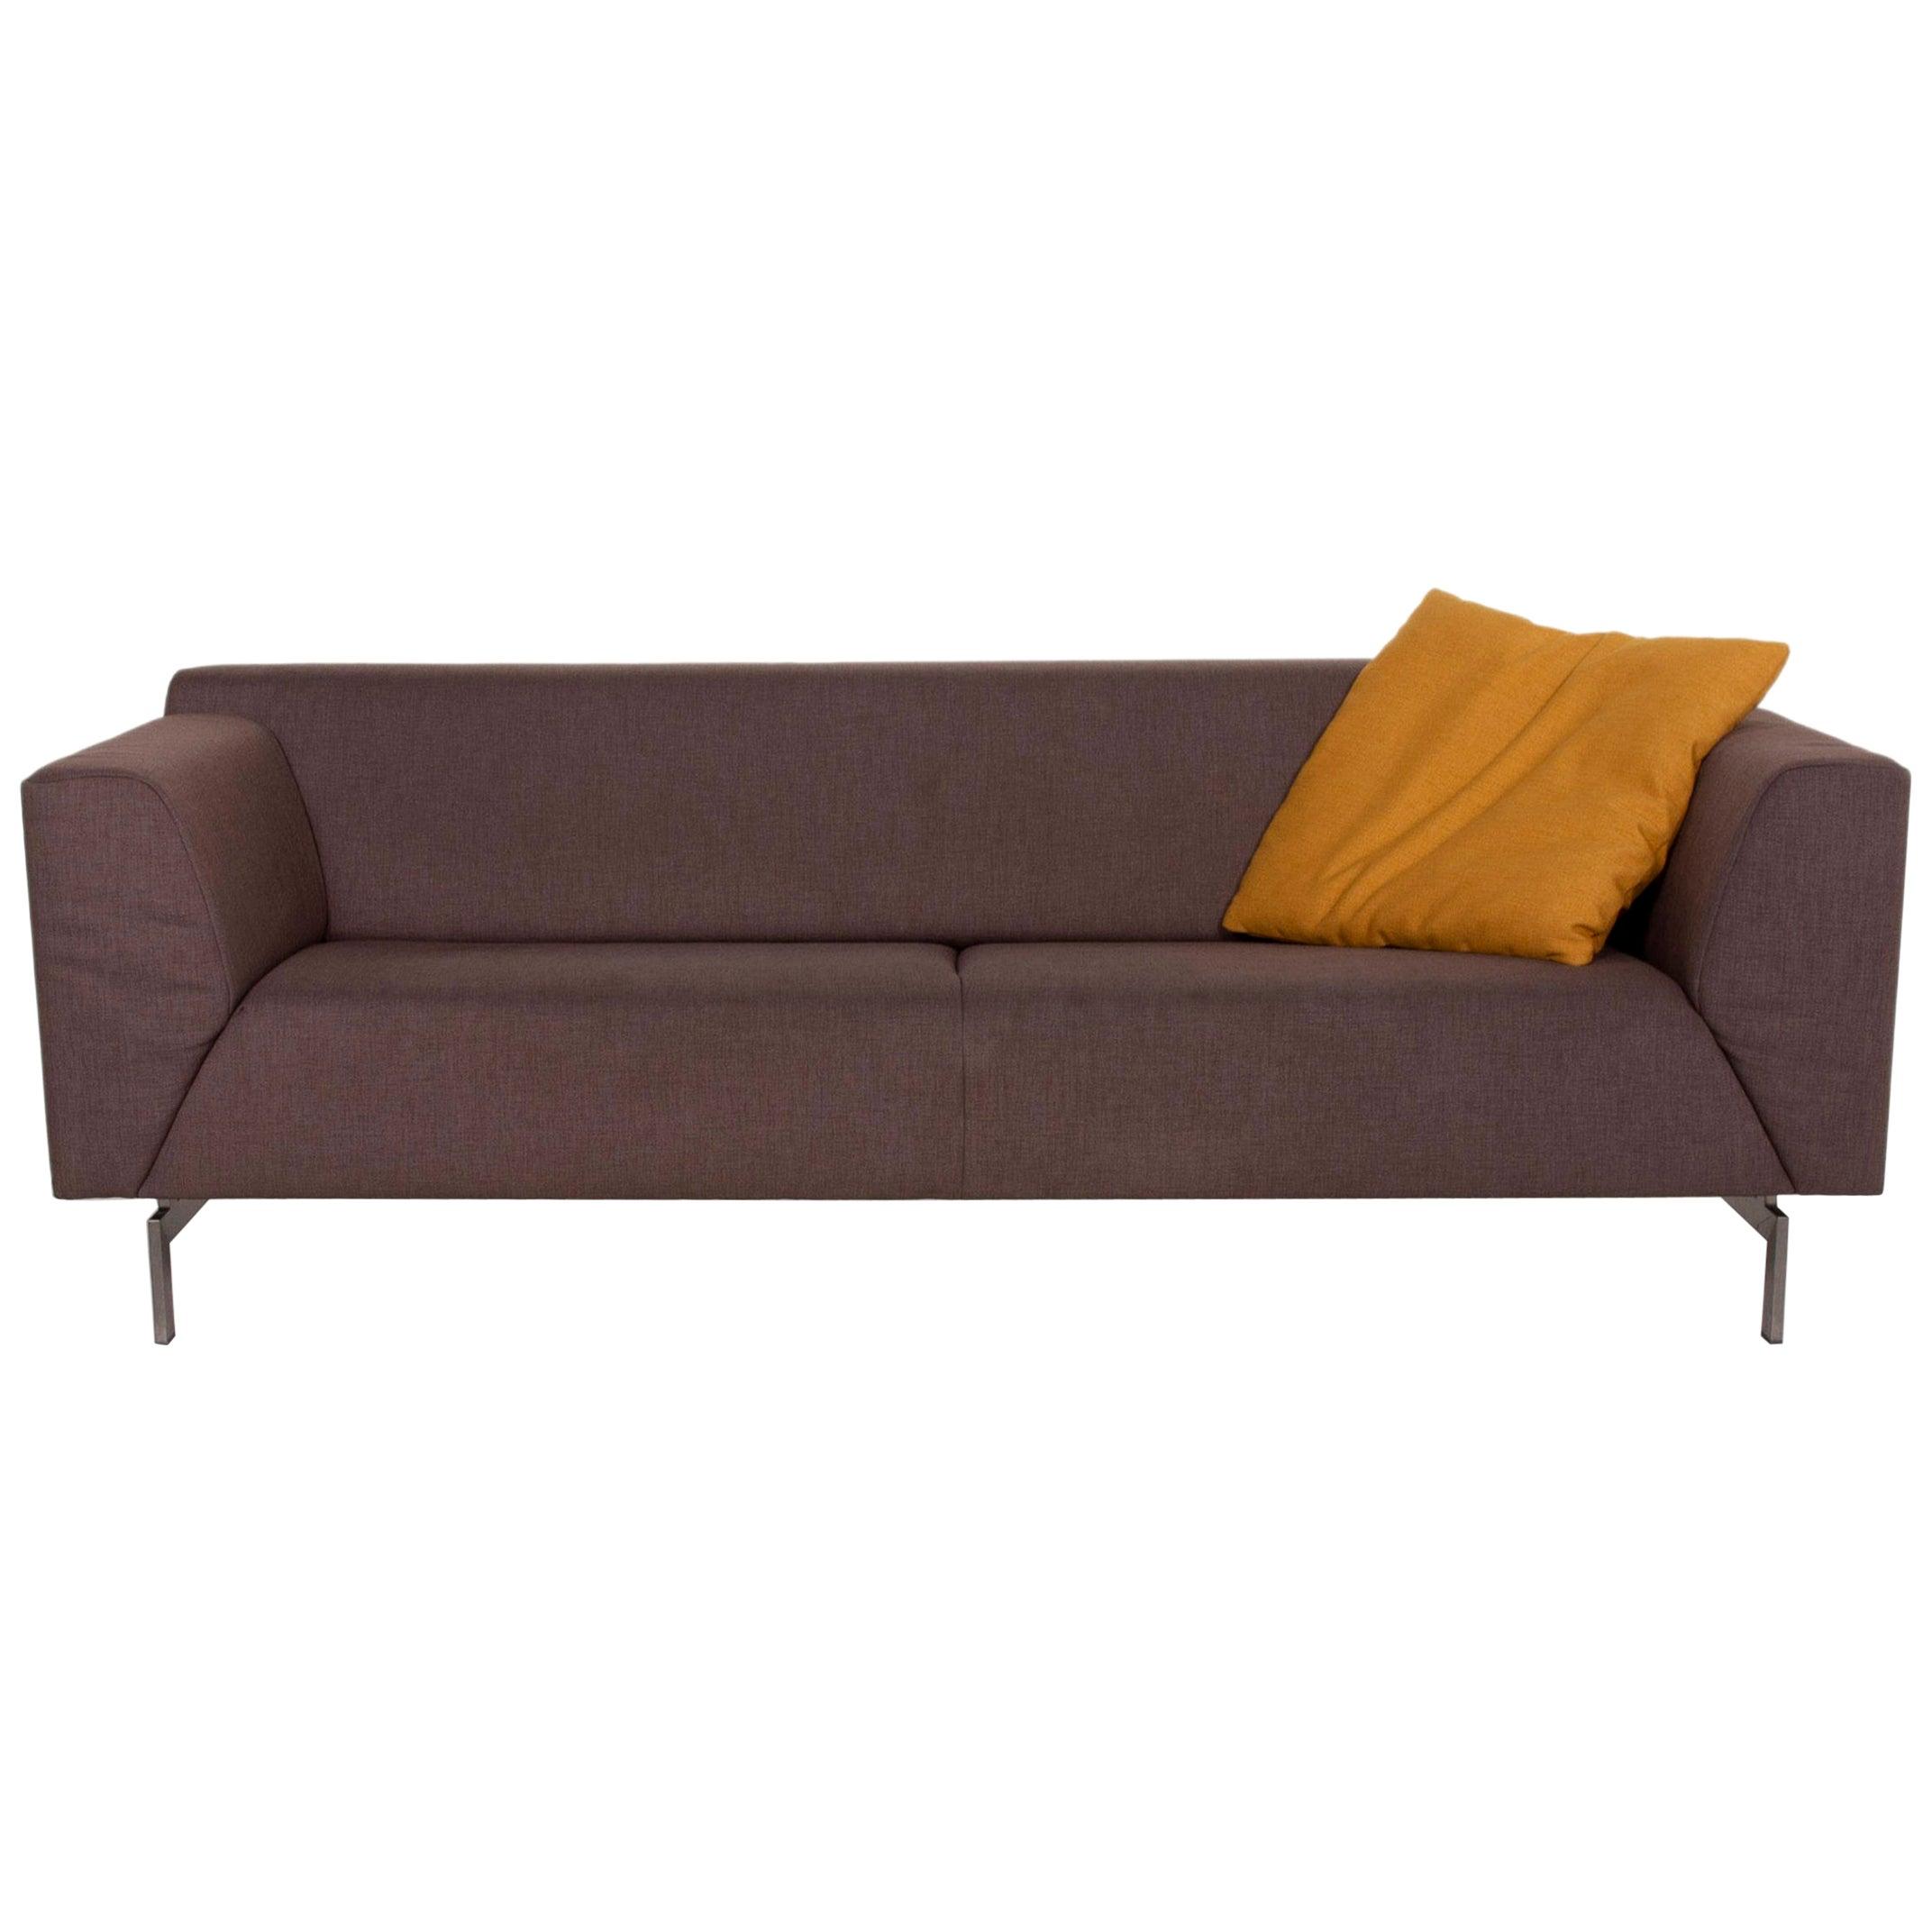 Rolf Benz 318 Linea Fabric Sofa Gray Two-Seat